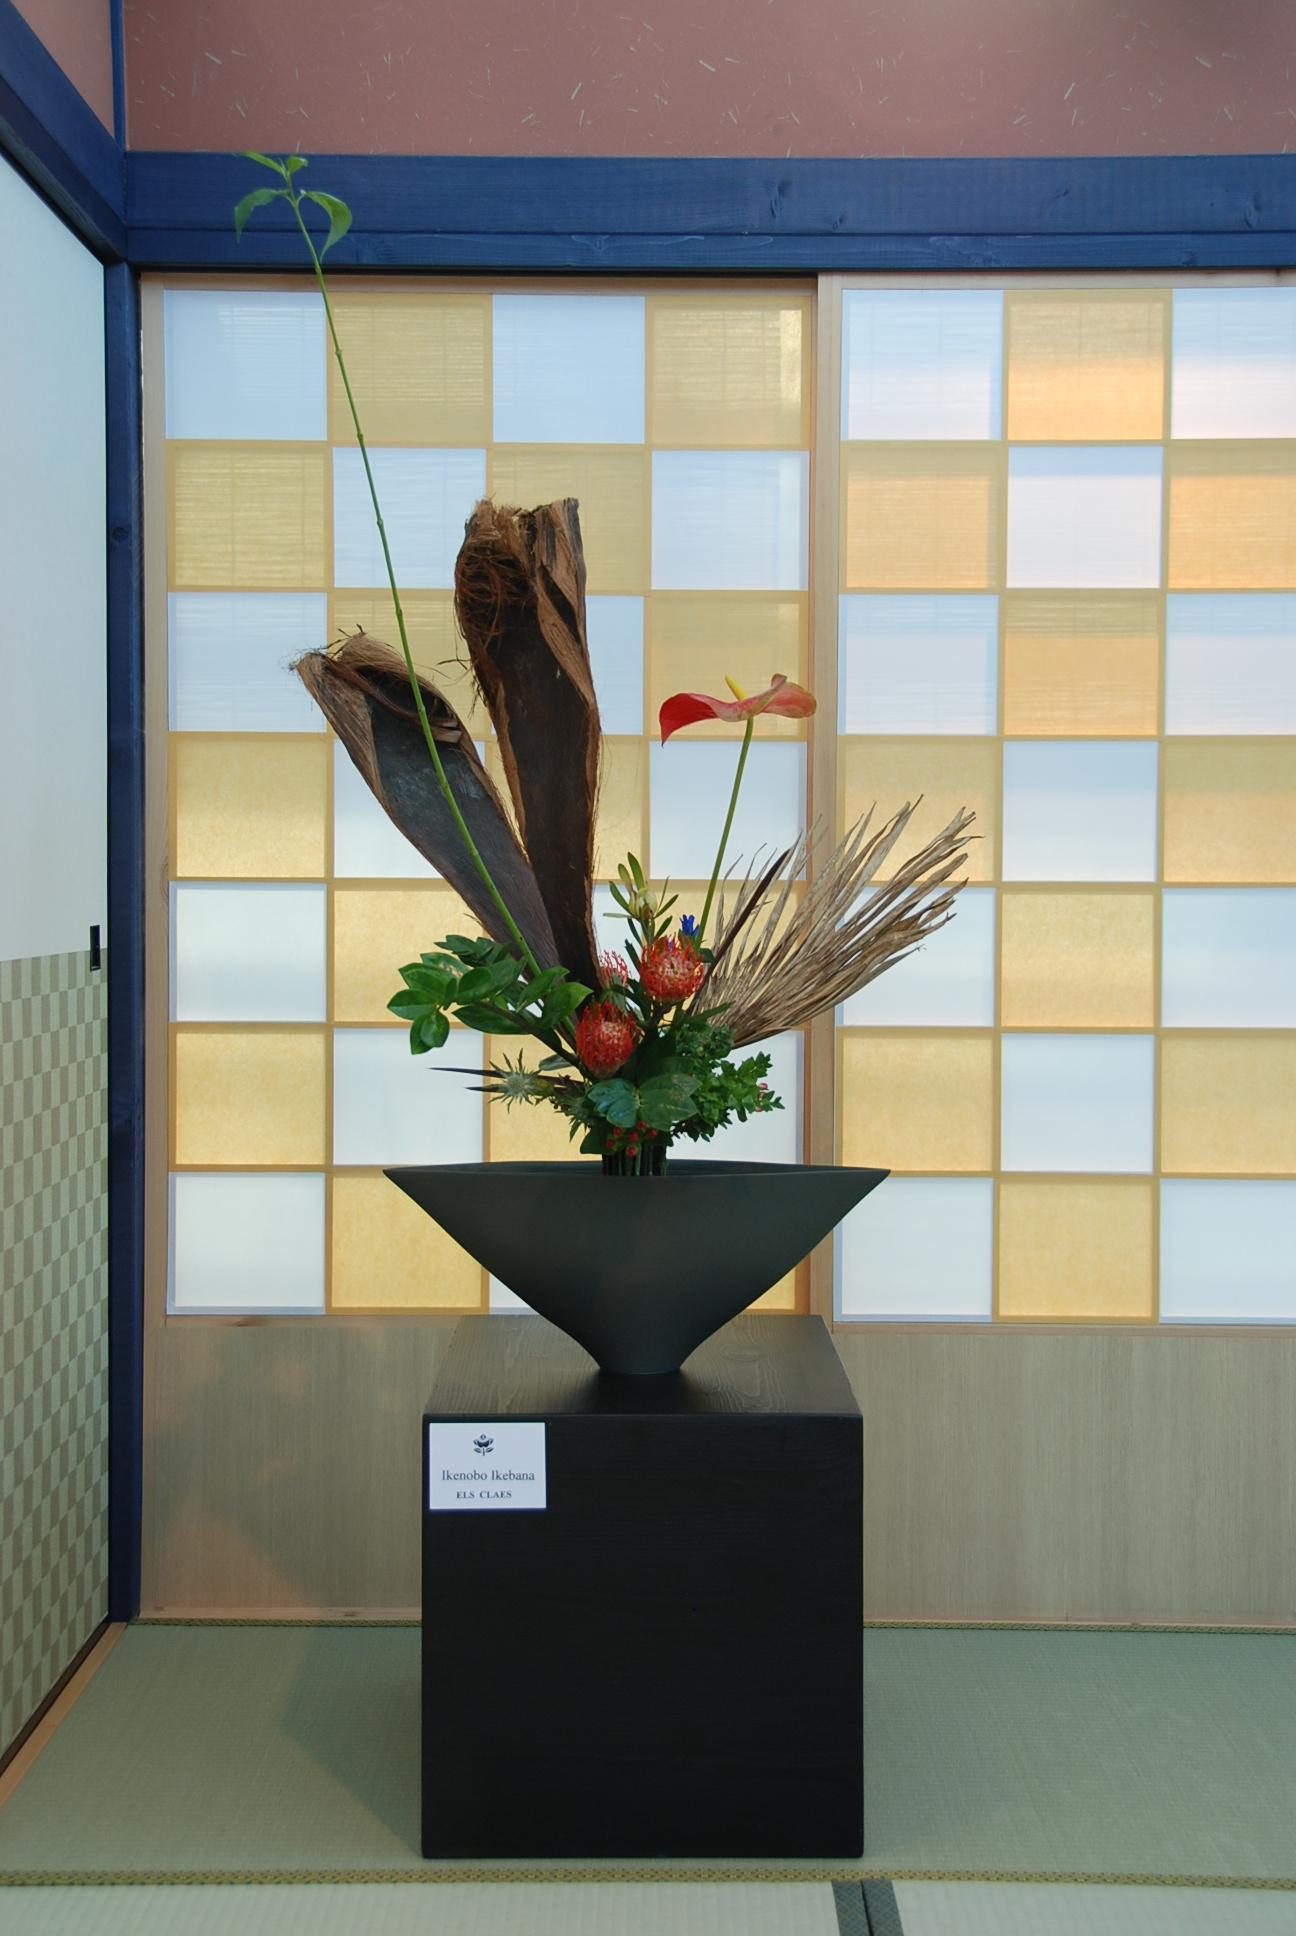 floriade venlo 2012 (3).JPG